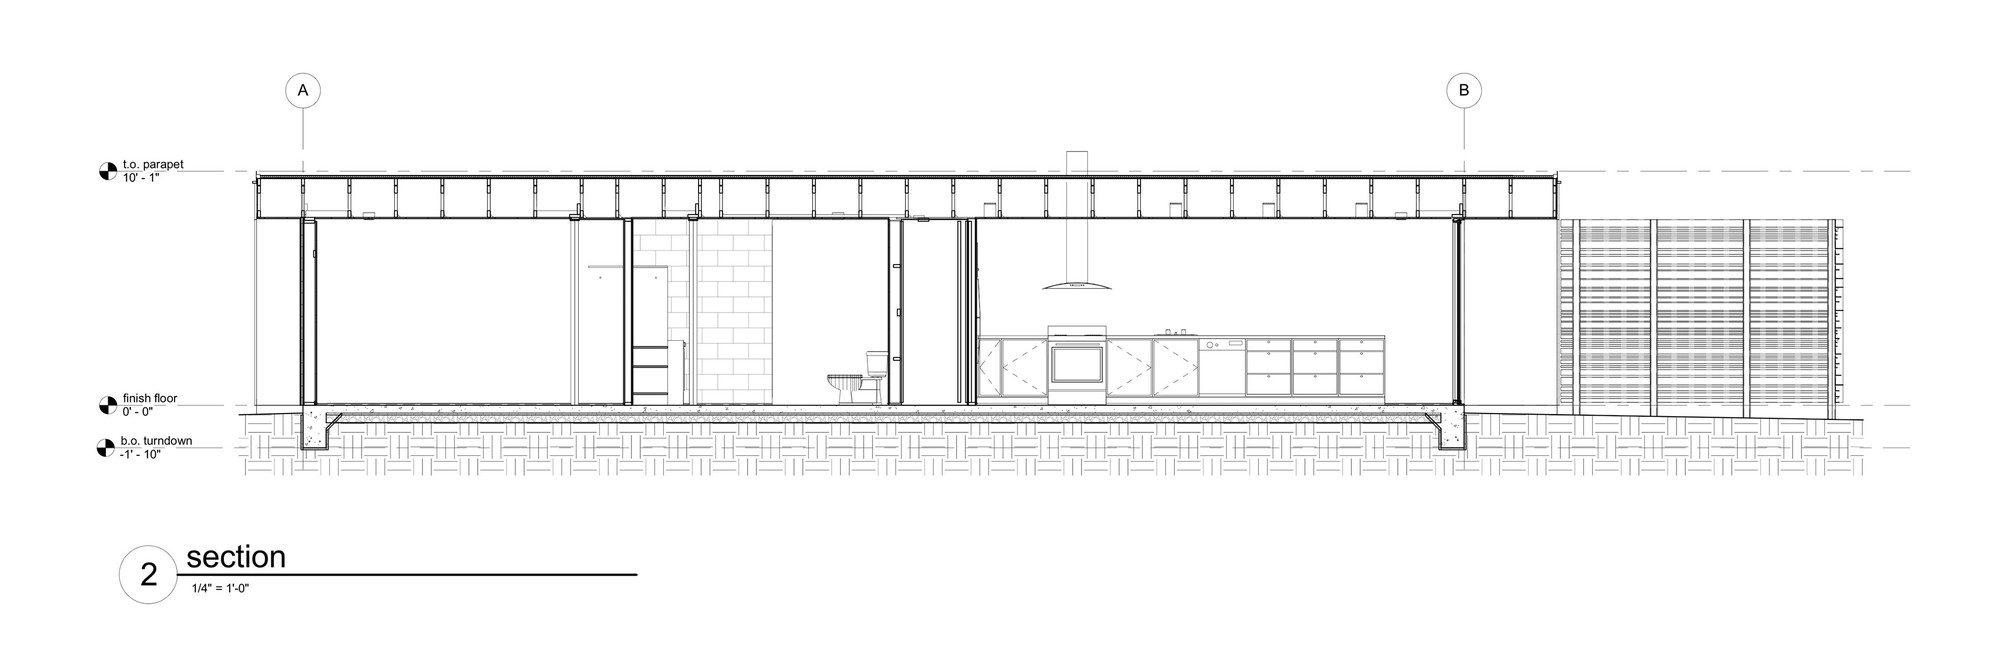 Vali homes prototype colab studio 180 degrees design for 180 degree salon